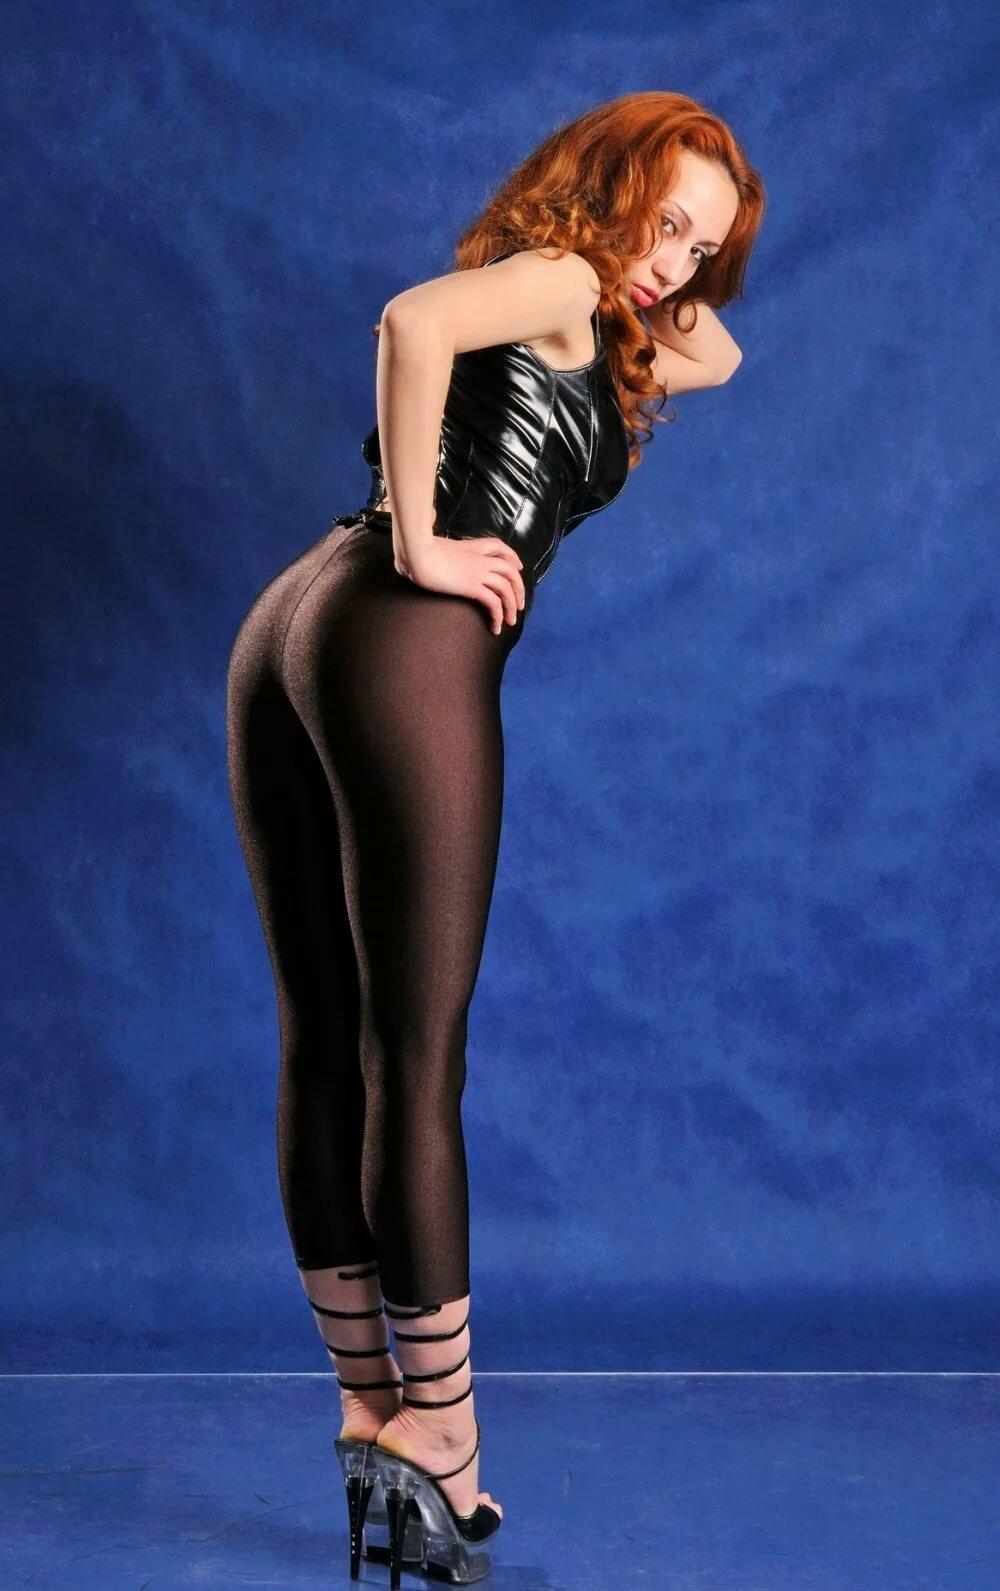 Redhead leggings naked porn video